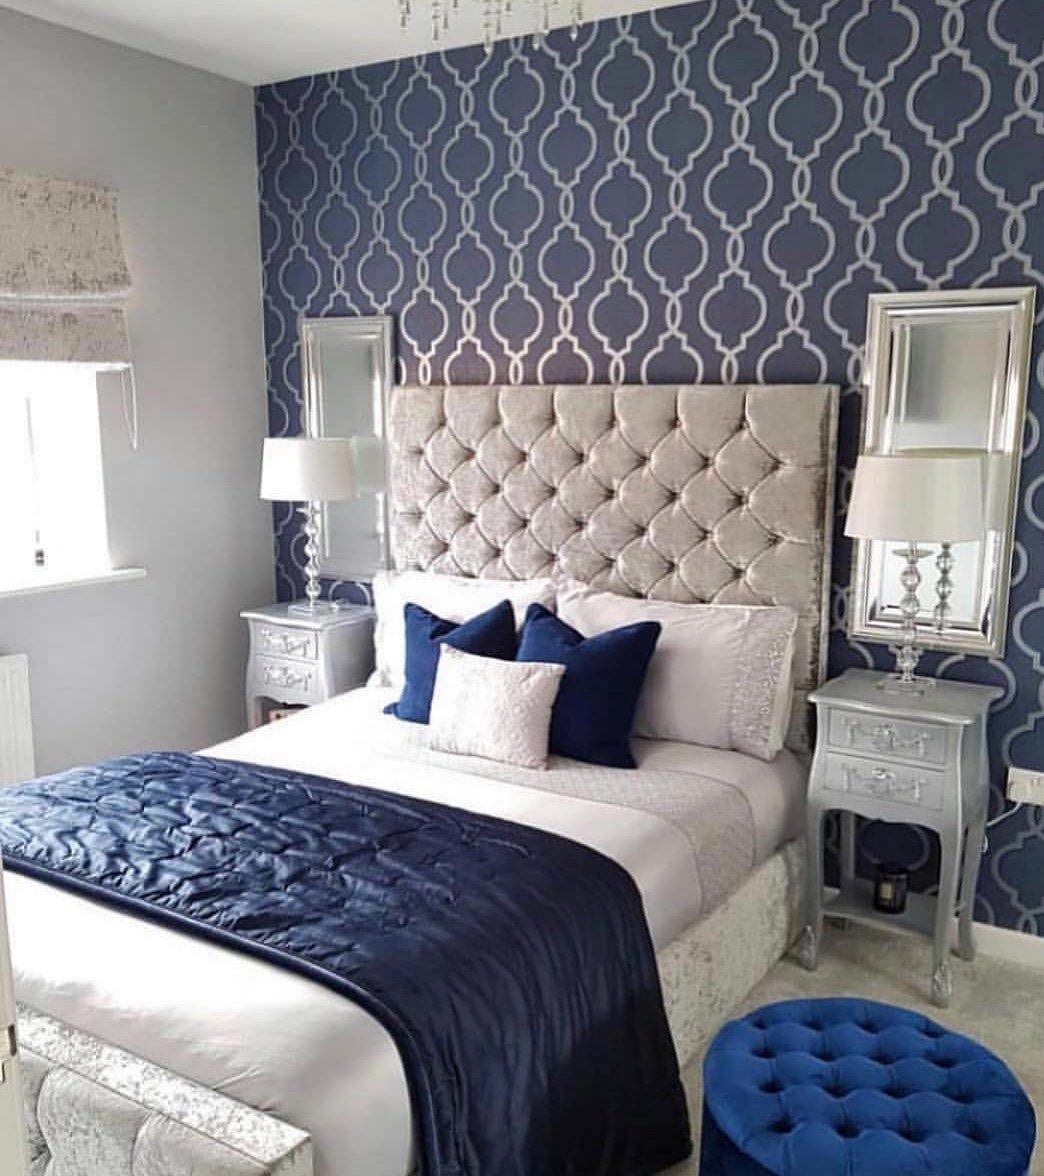 Best Wm6549301 Geometric Trellis Navy Blue Gold Wallpaper With 400 x 300